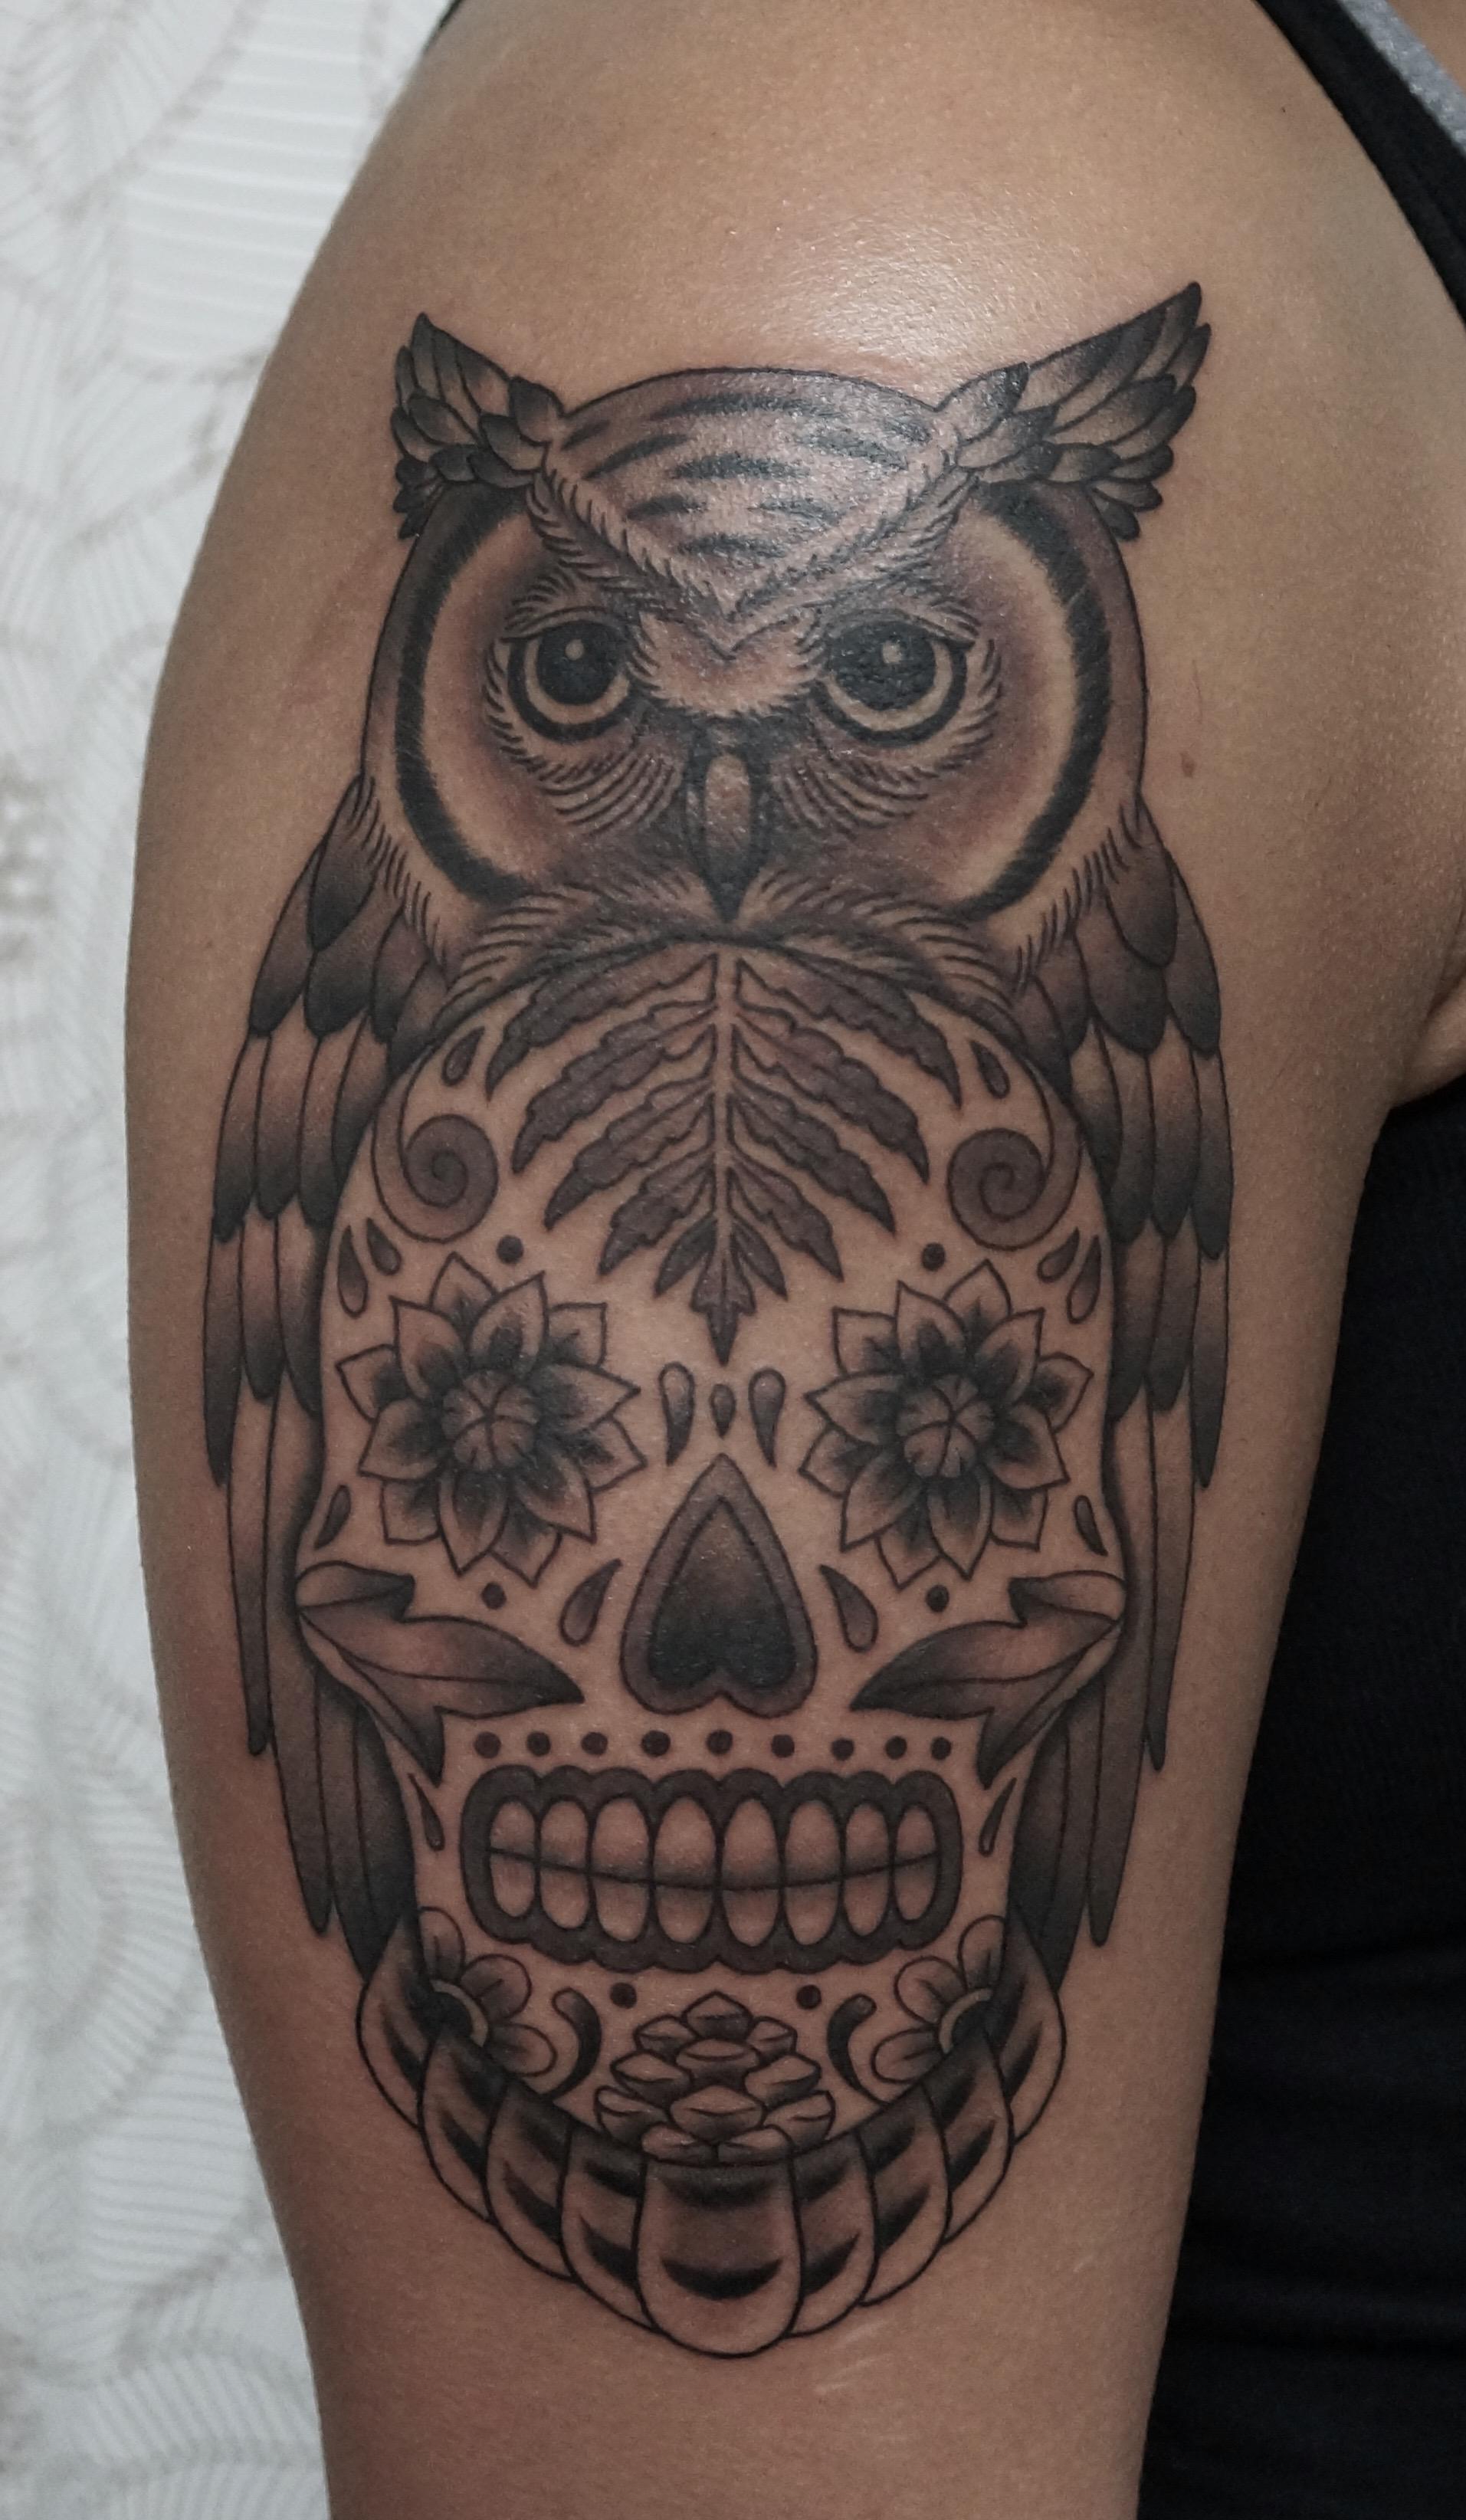 PNW Owl Sugarskull